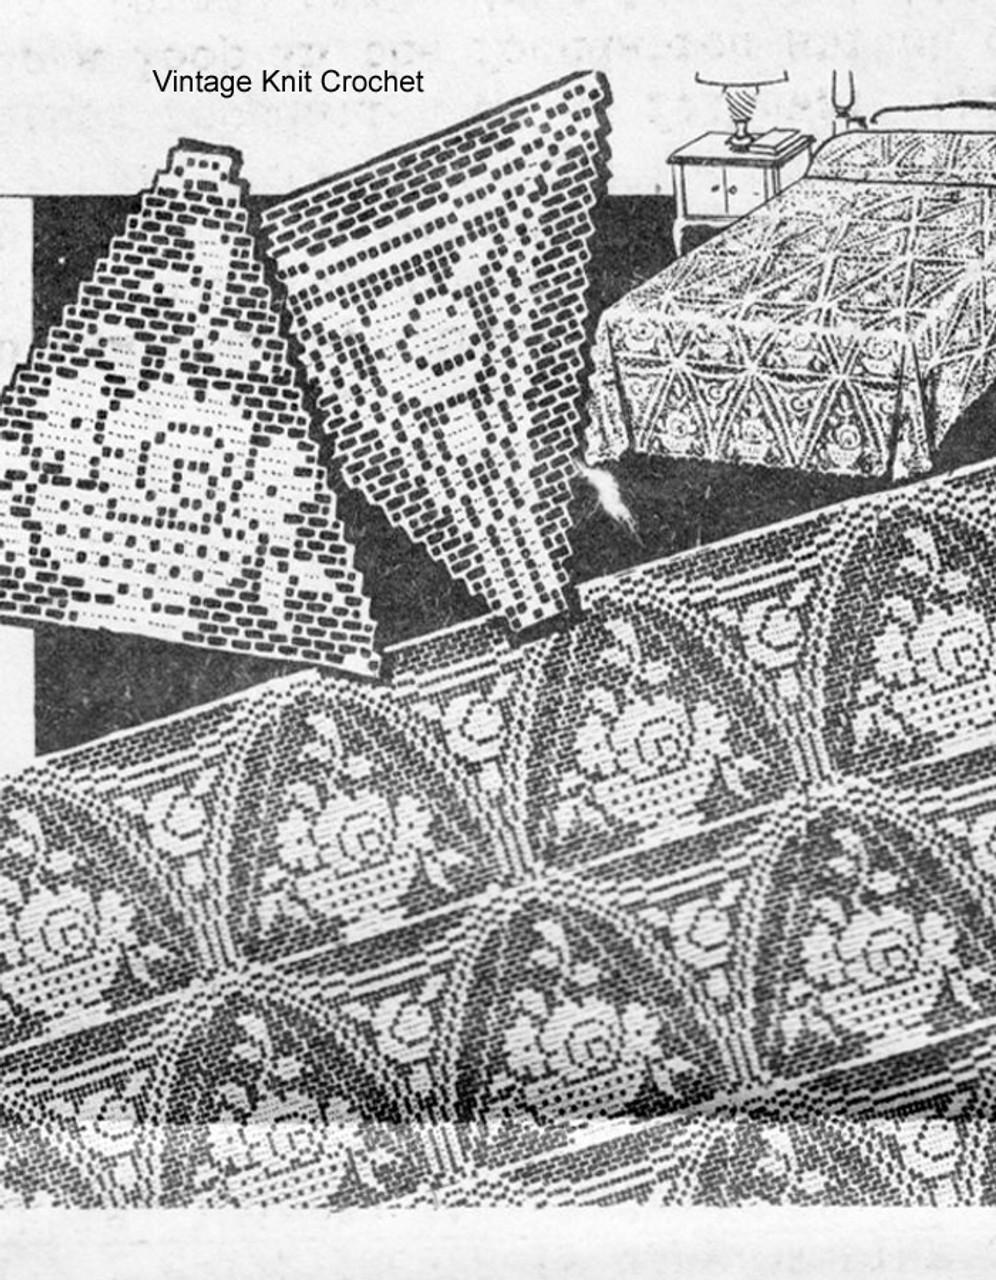 Filet Crochet Bedspread Pattern, Triangle Medallions No 6206